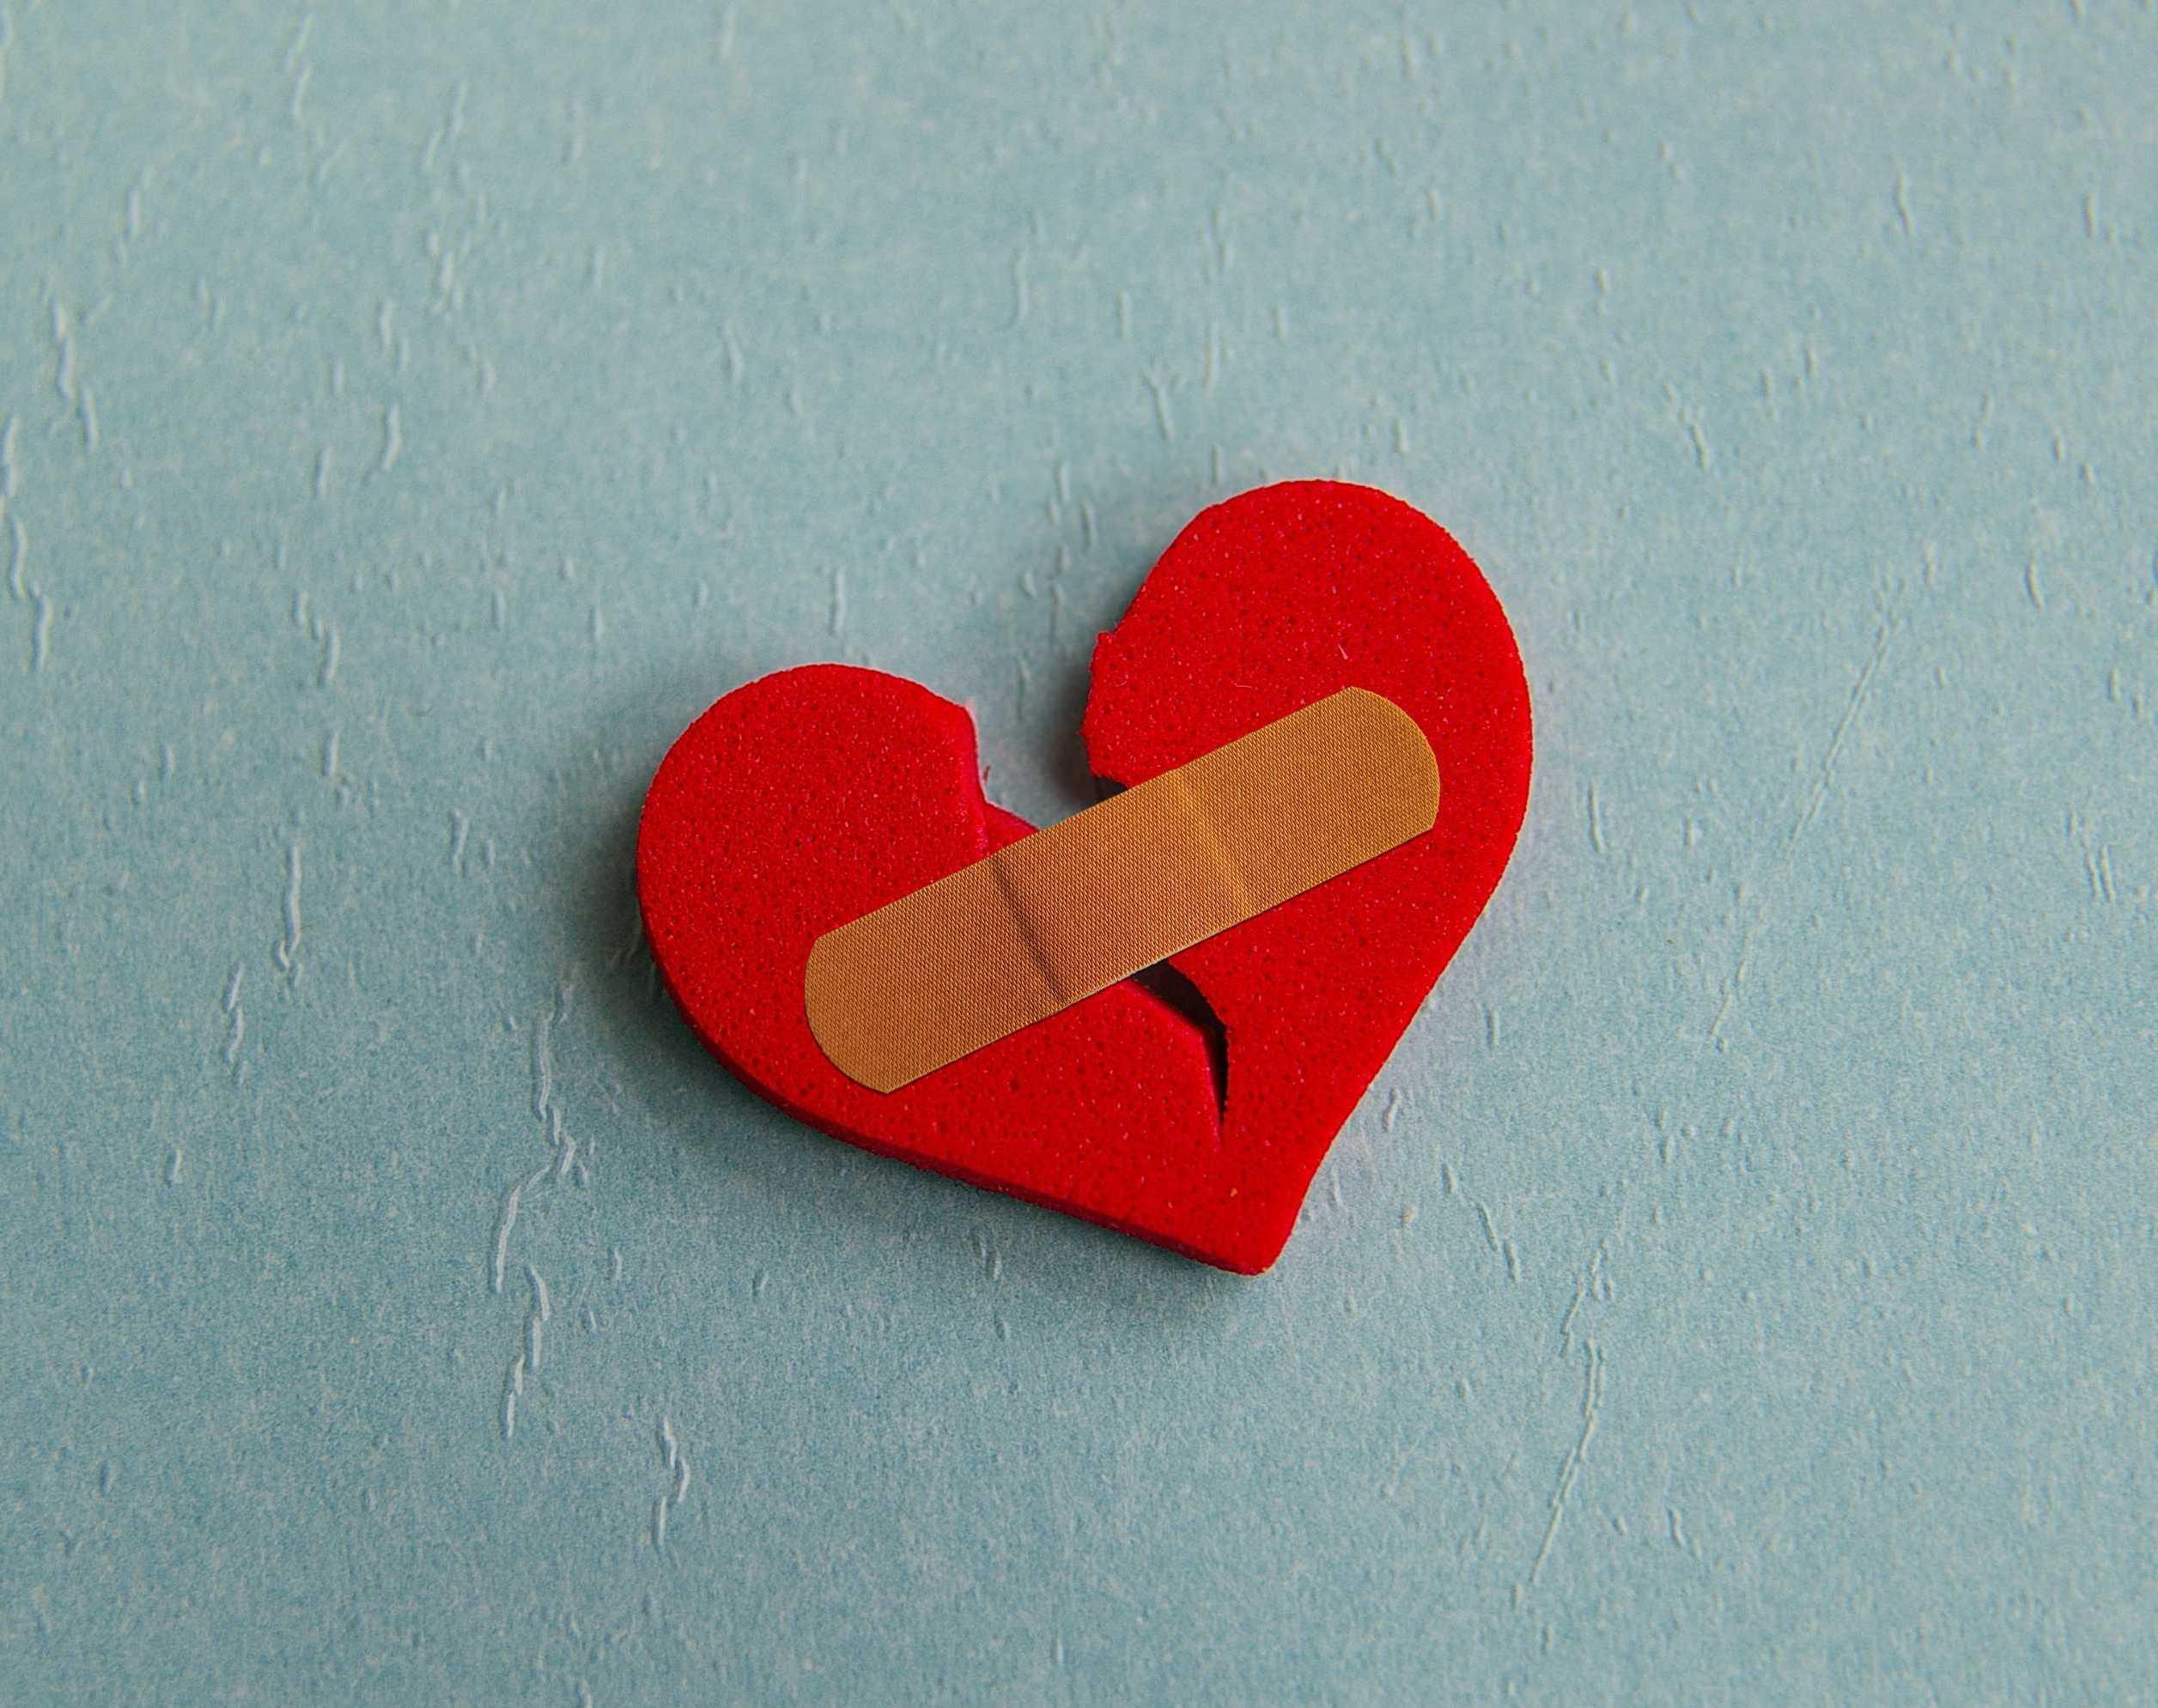 2014-03-28-Heartwithbandaid.jpg